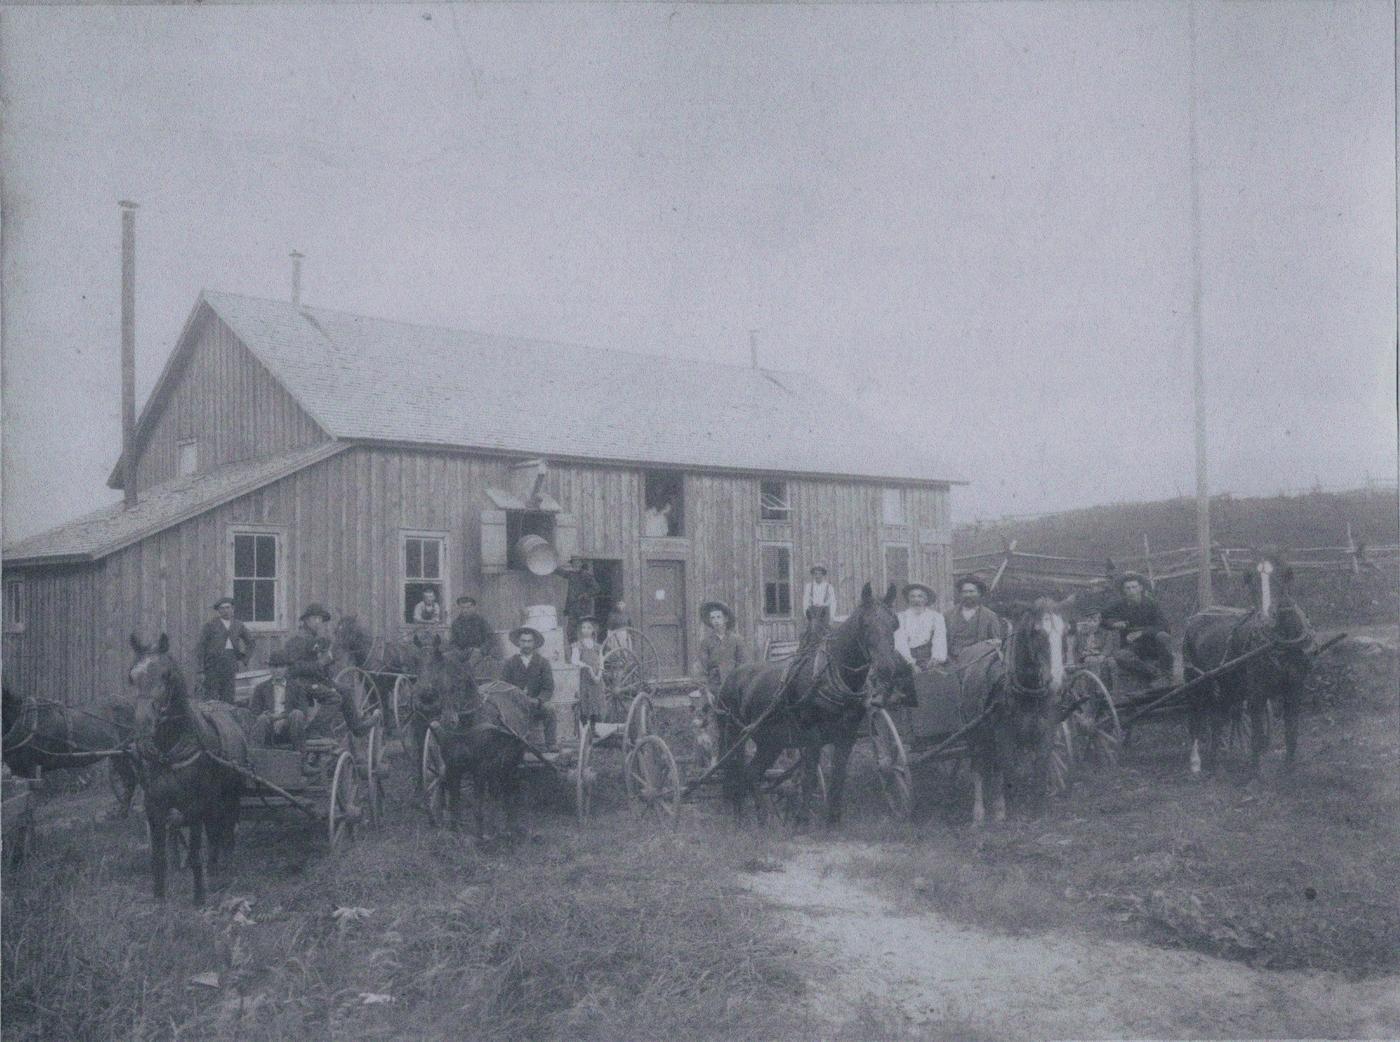 Dairyfarm 1910.jpg